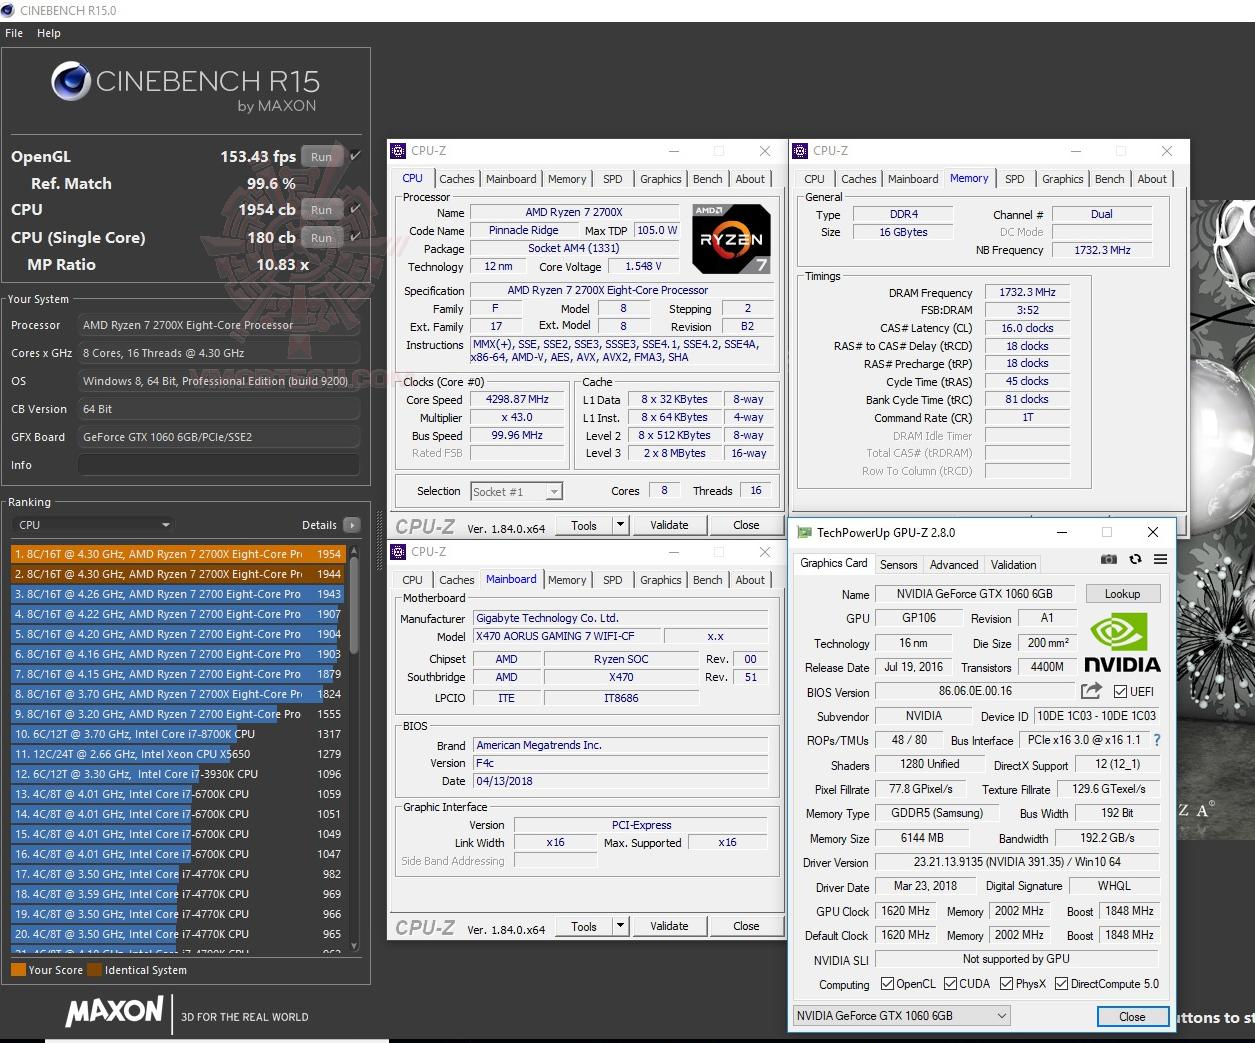 c15 oc AMD RYZEN 7 2700X PROCESSOR REVIEW